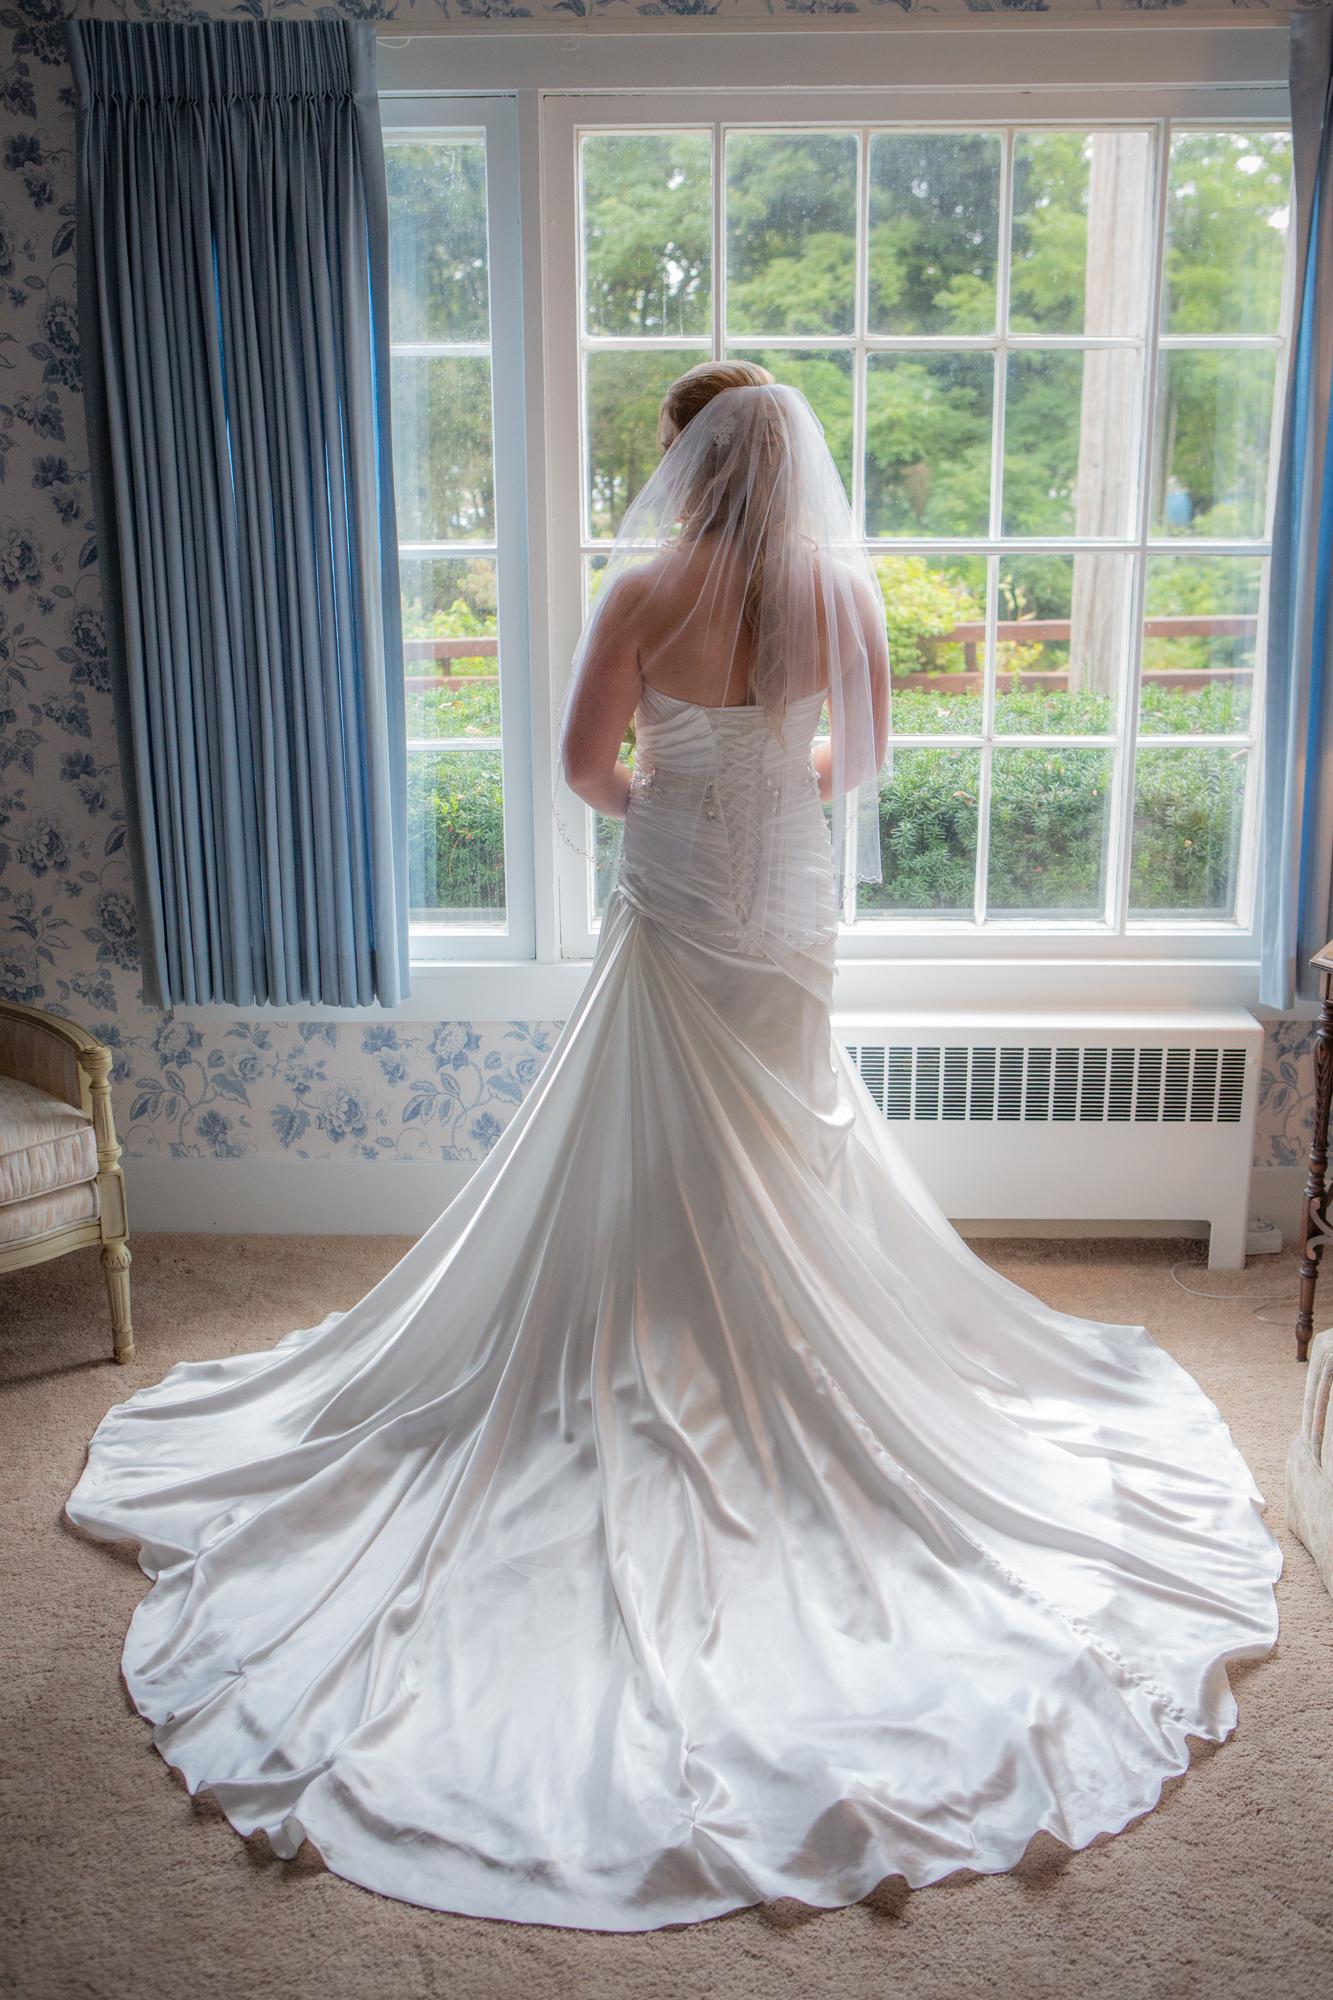 Raddison-Hotel-Corning-NY-Wedding-3676.jpg